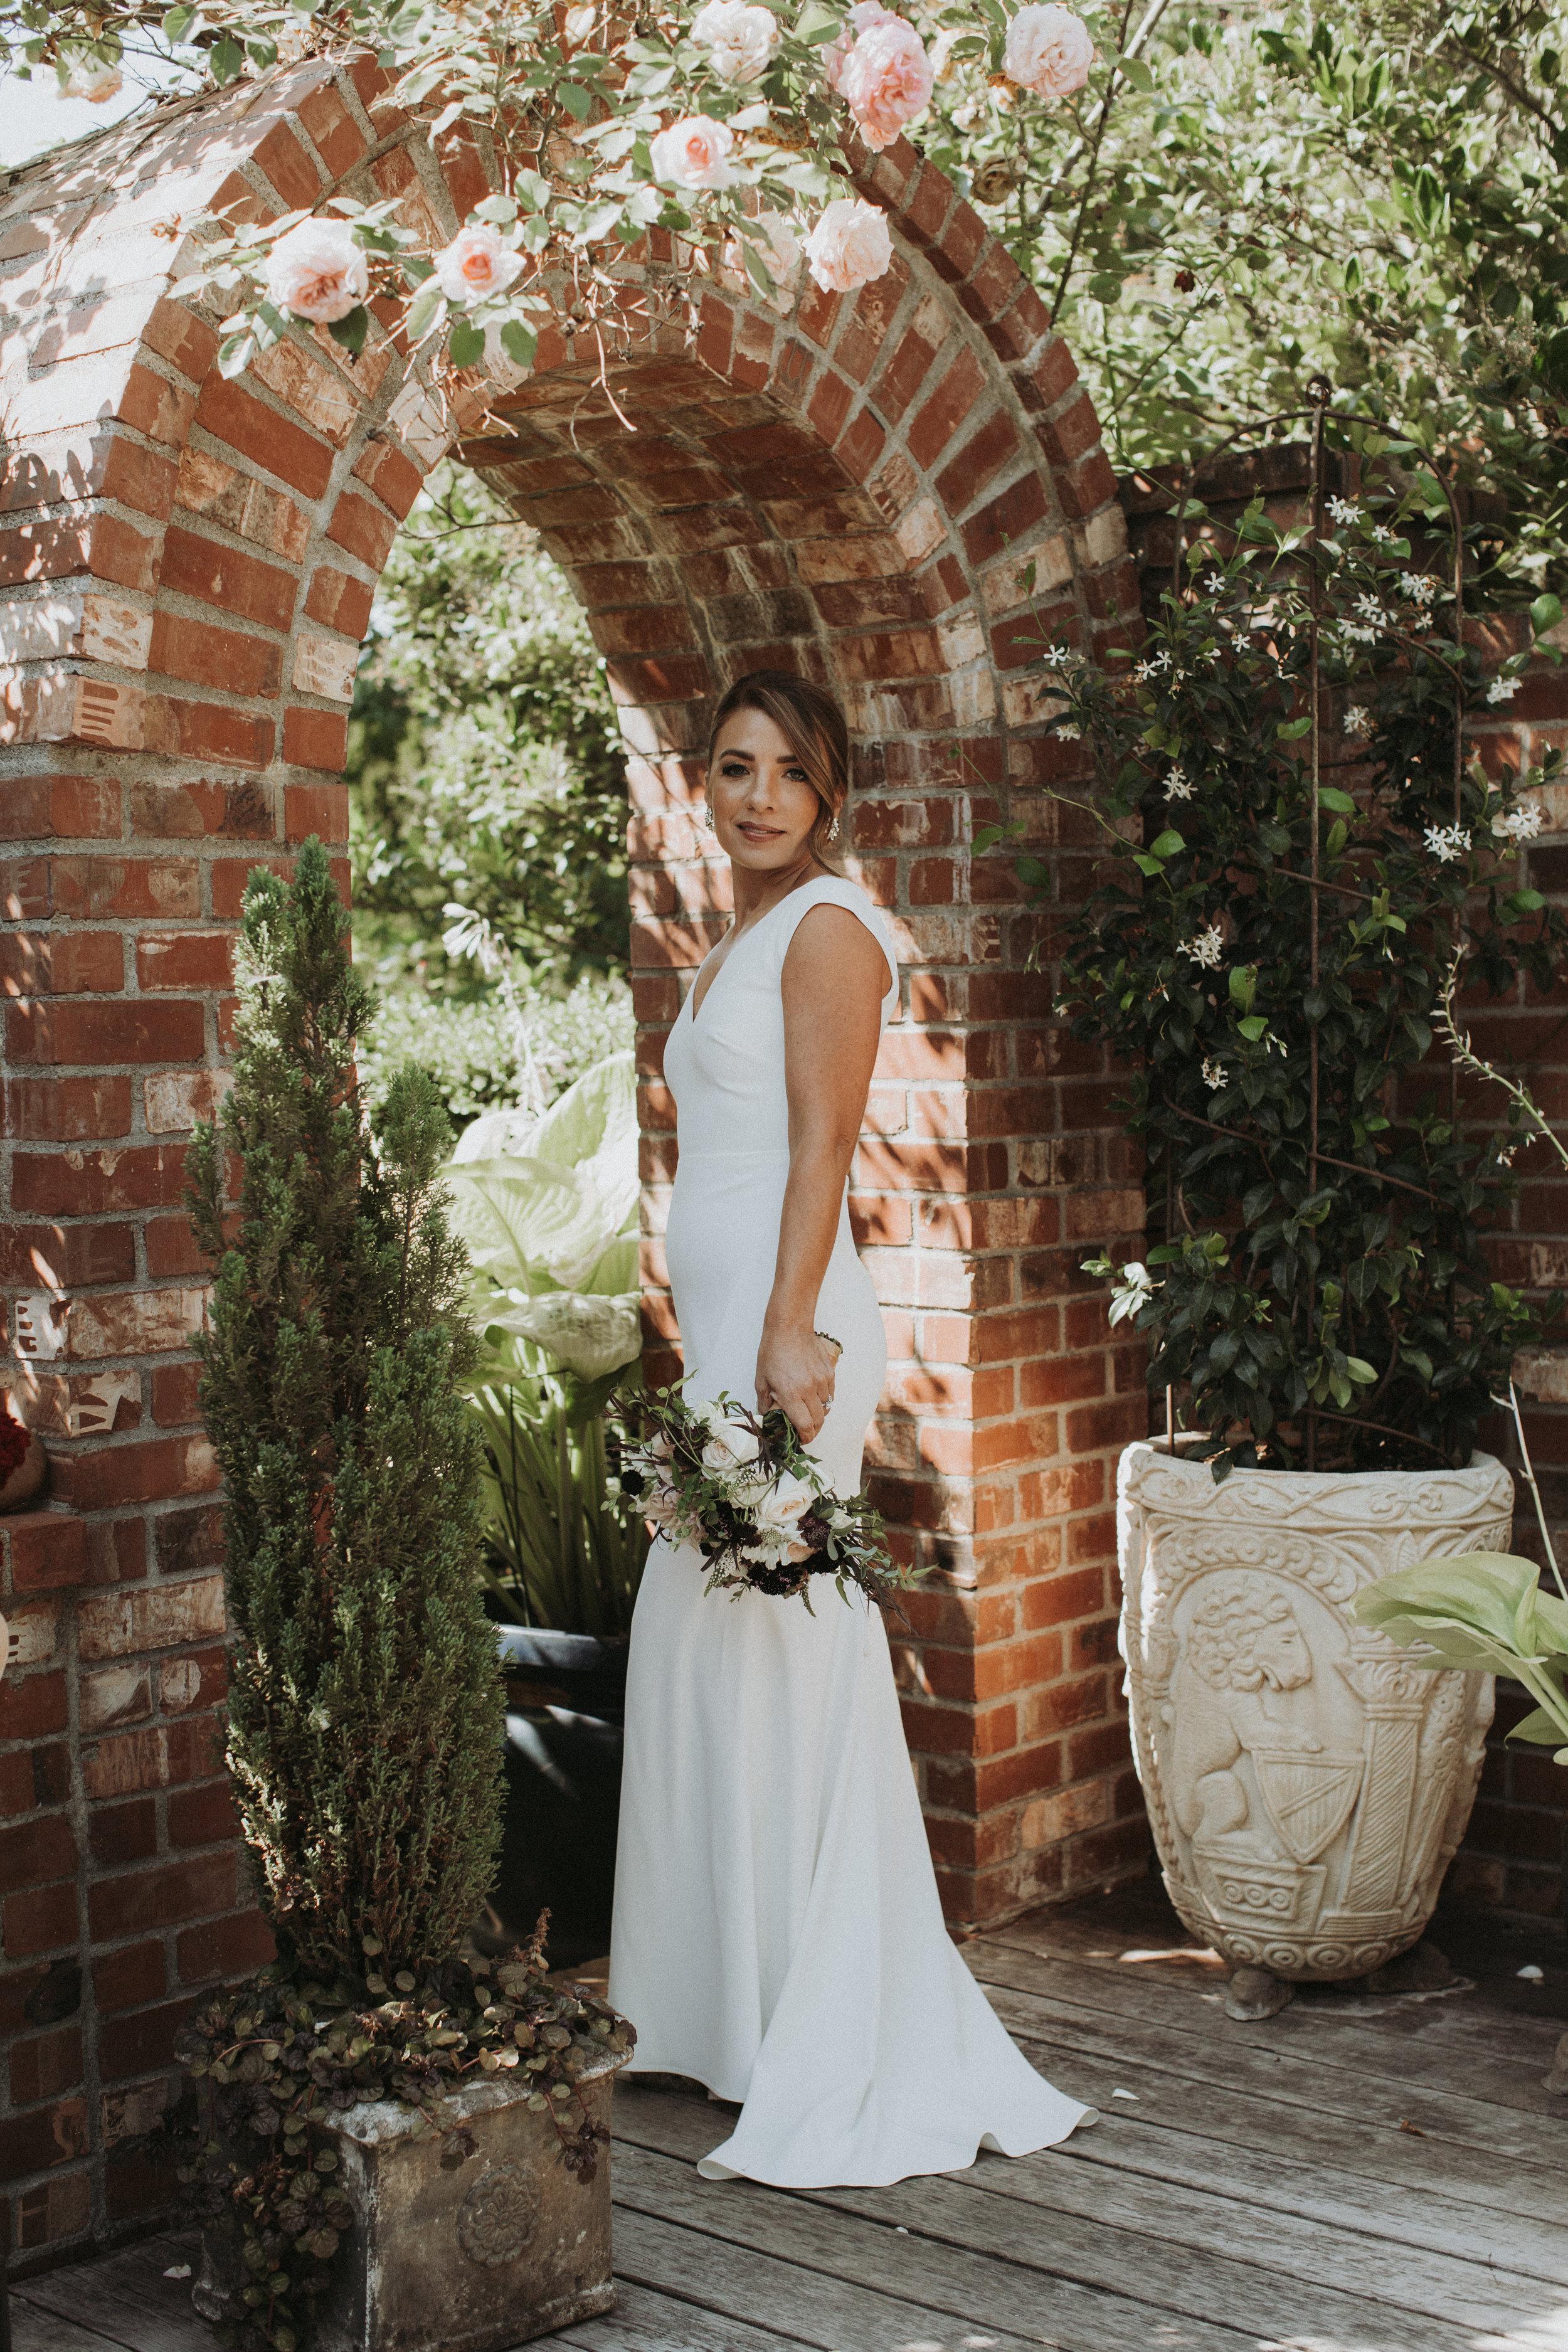 PORTLAND INTIMATE BACKYARD WEDDING_JENNY CHOKBENGBOUN PHOTO-100.JPG